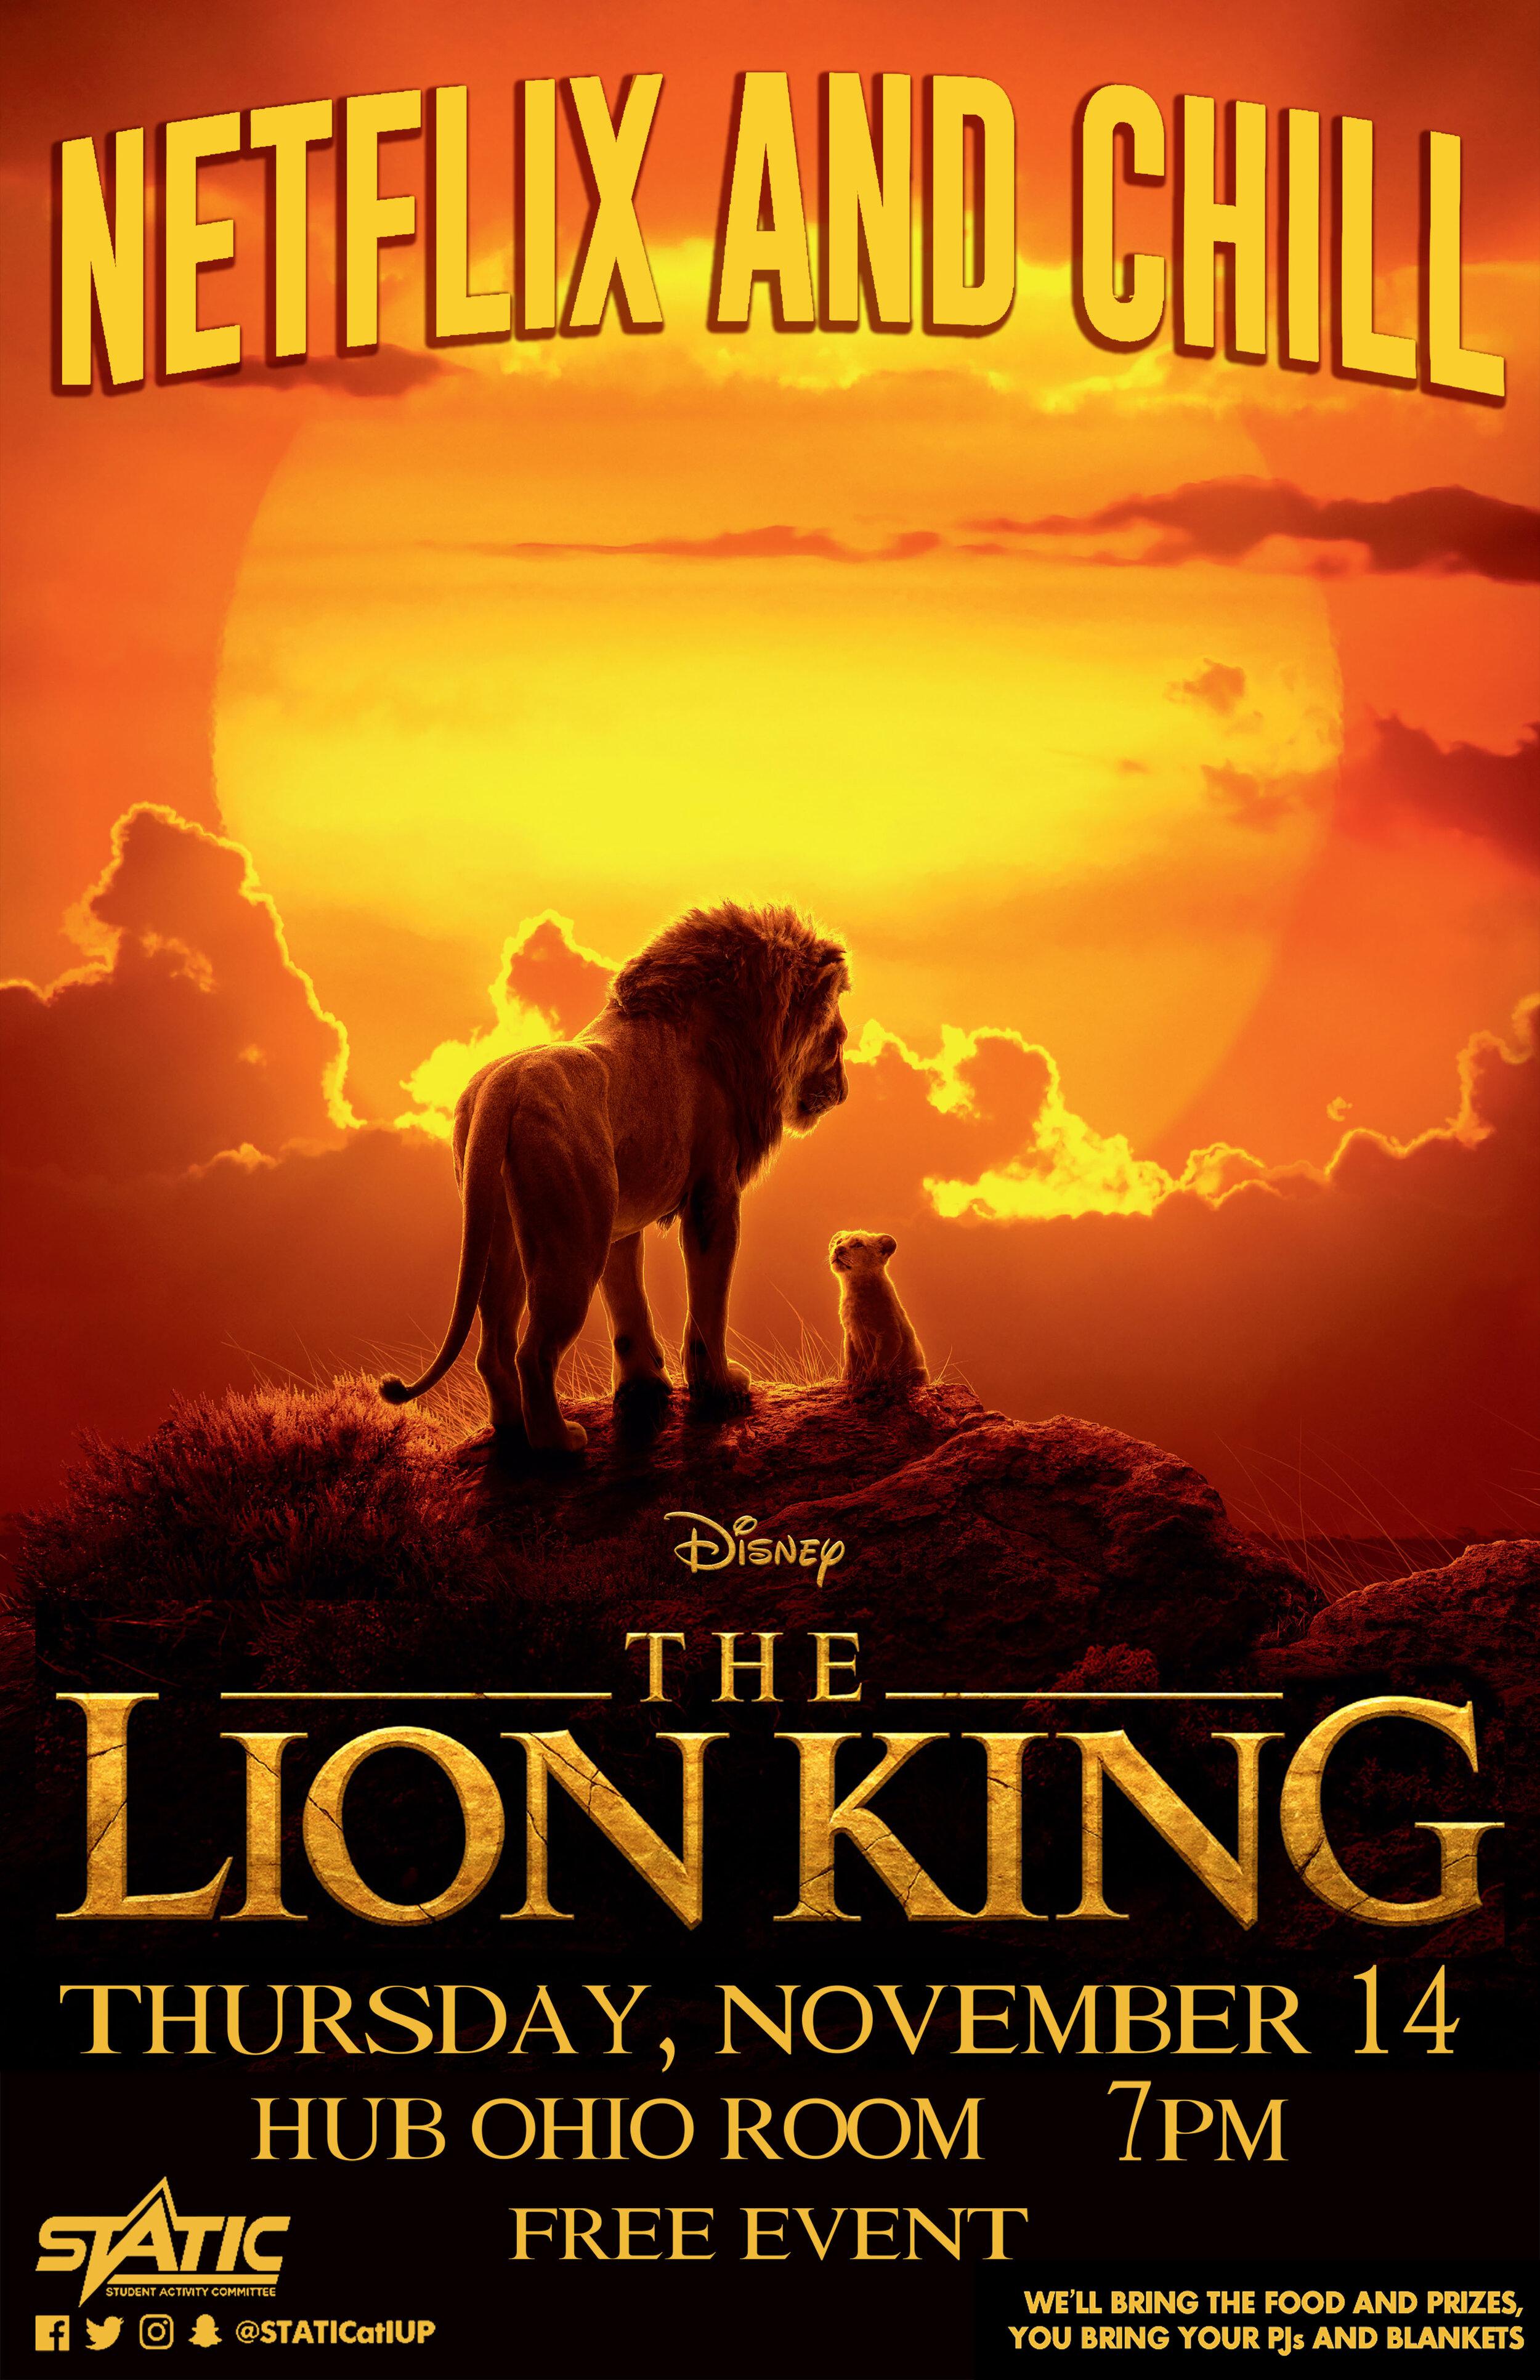 LION KING POSTER (2).jpg